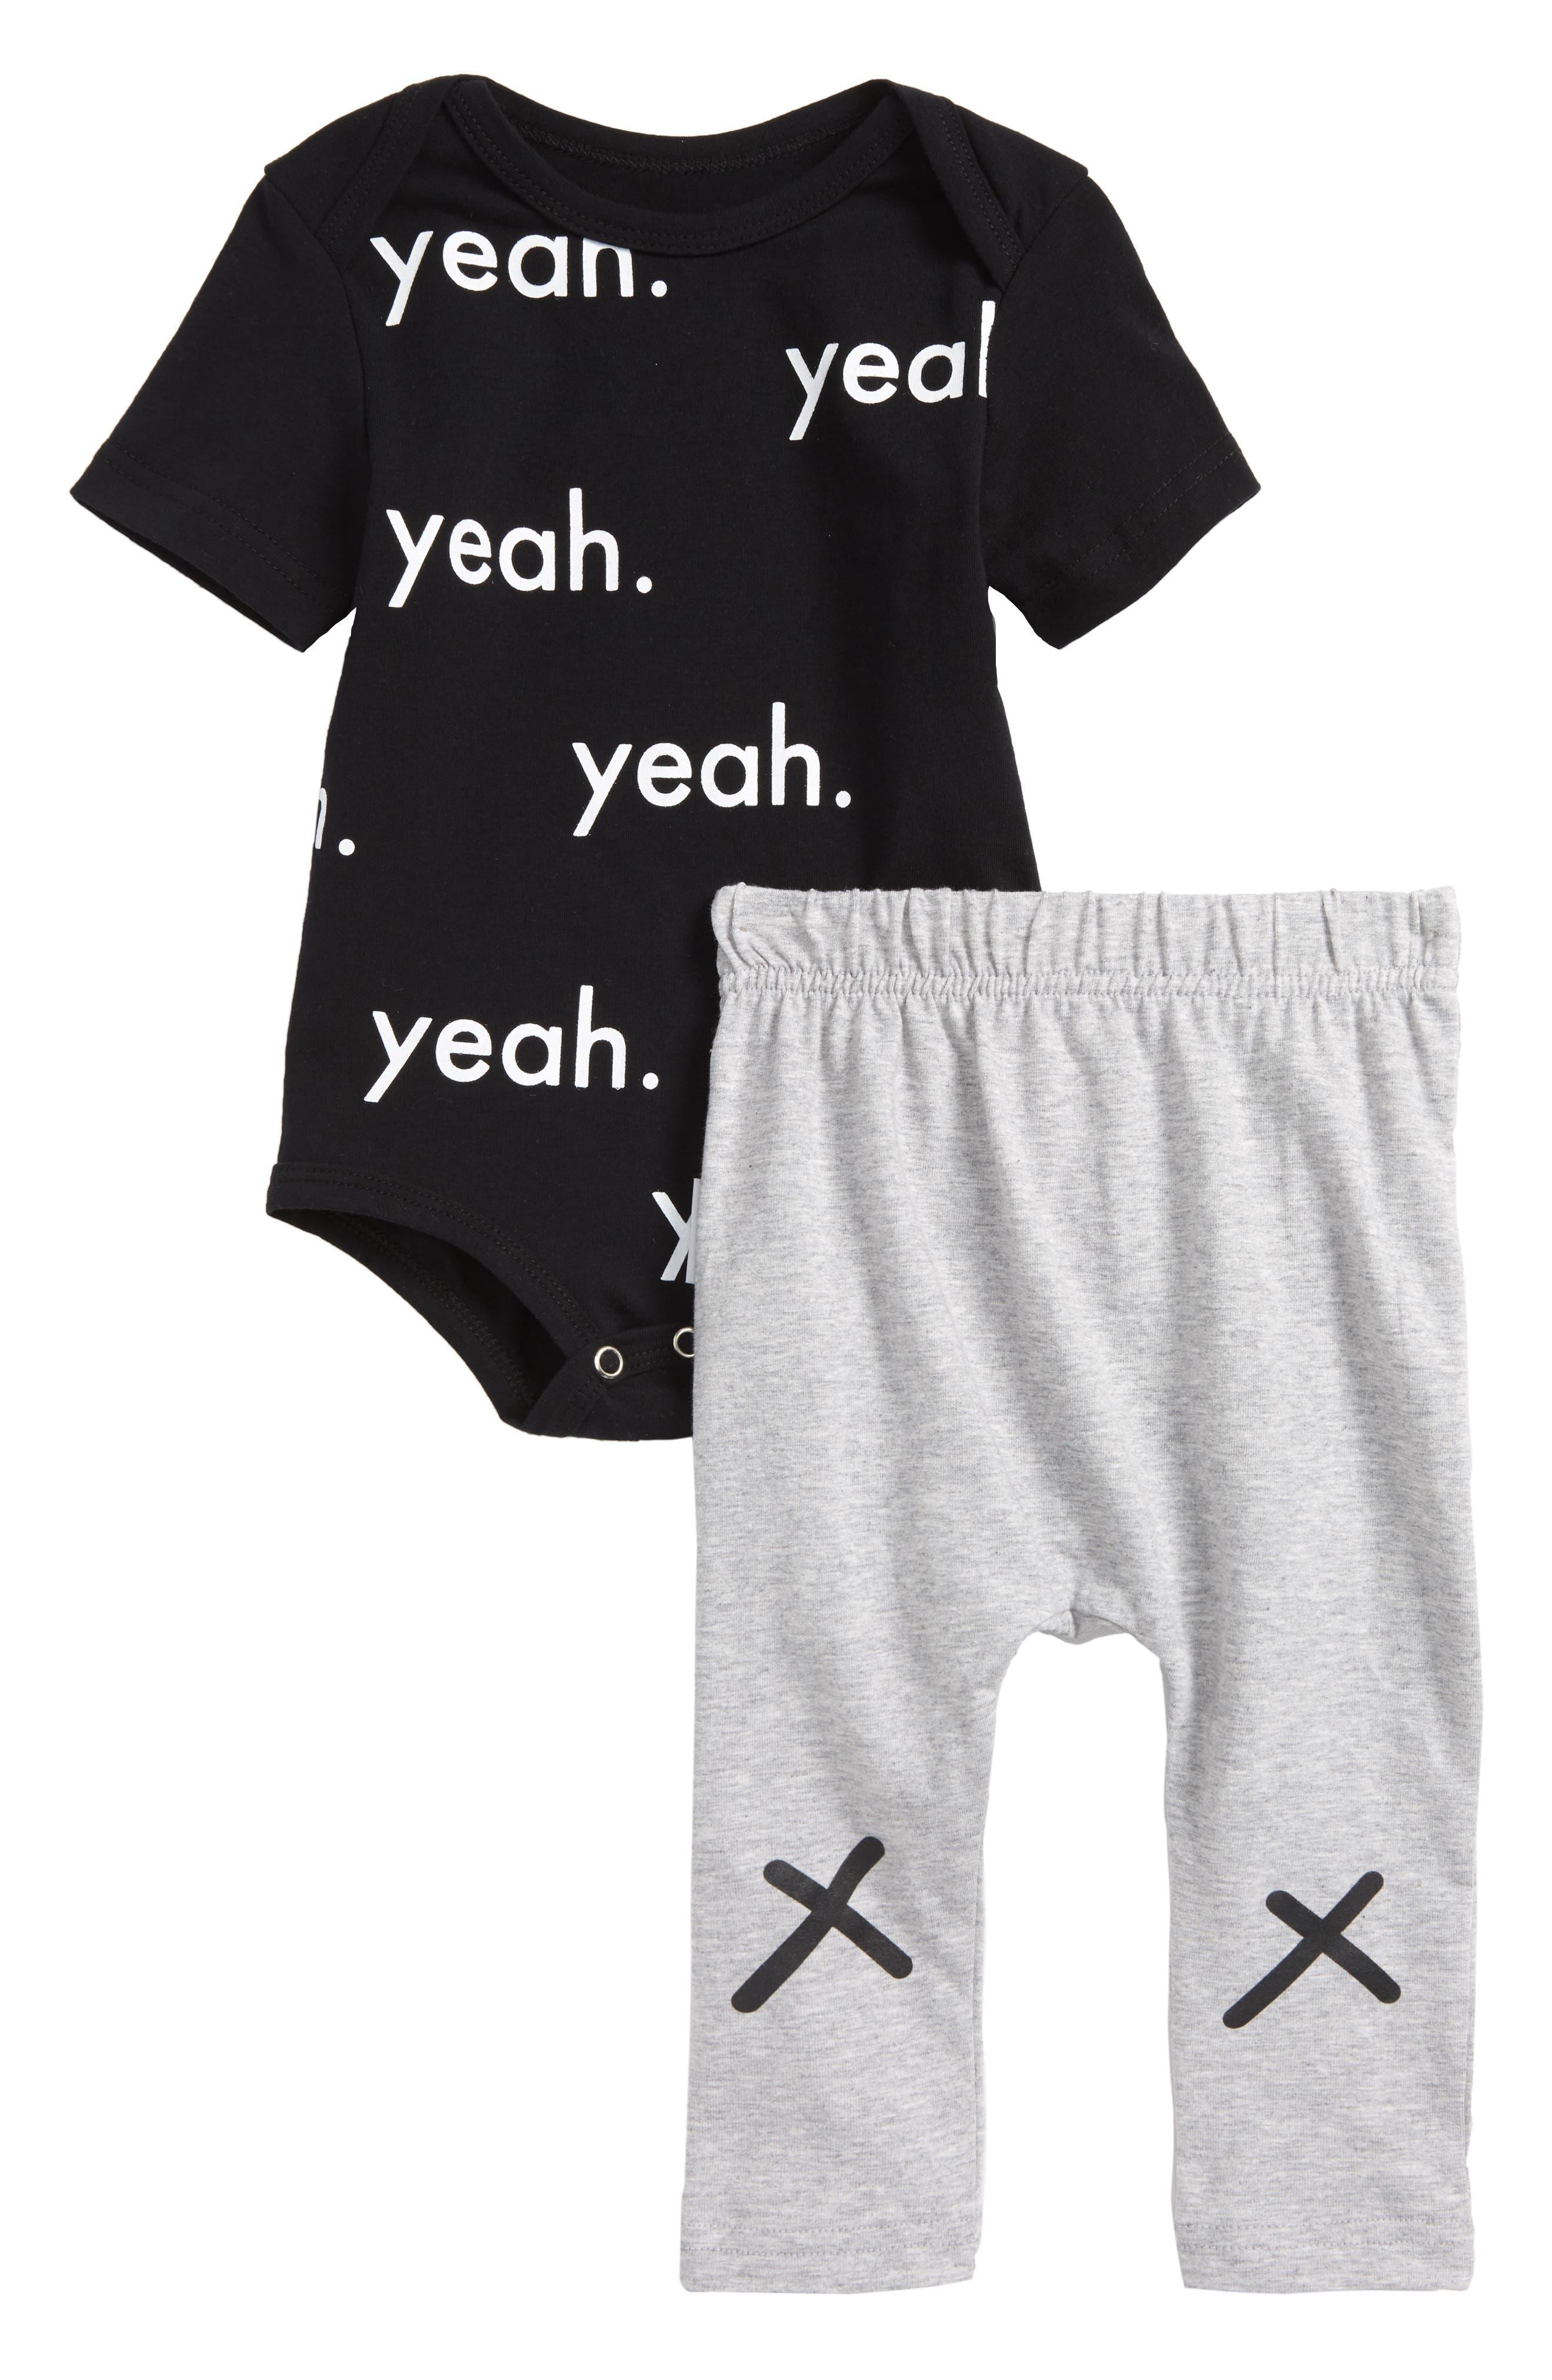 Yeah Bodysuit & Pants Set,                             Main thumbnail 1, color,                             Black/ Grey